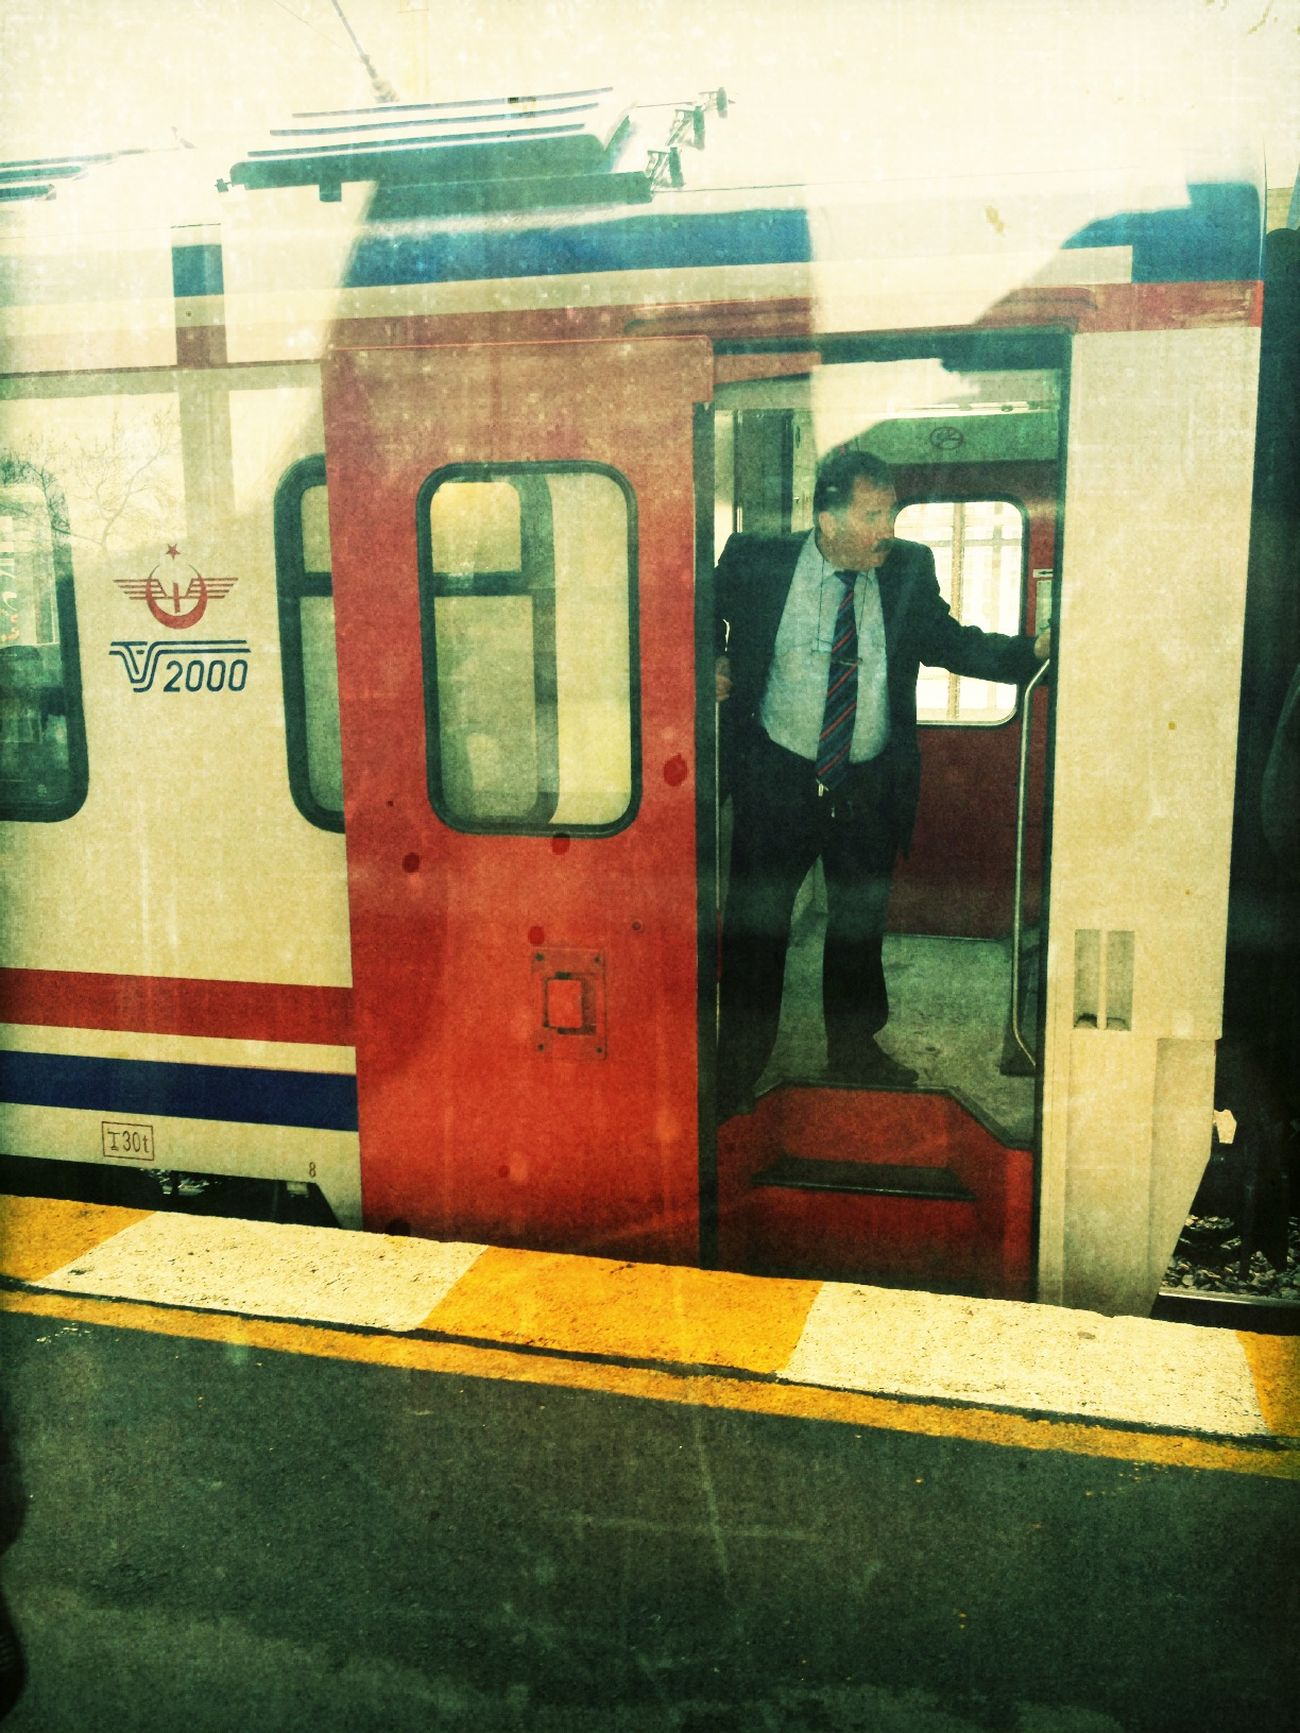 at Söğütlüçeşme Tren İstasyonu